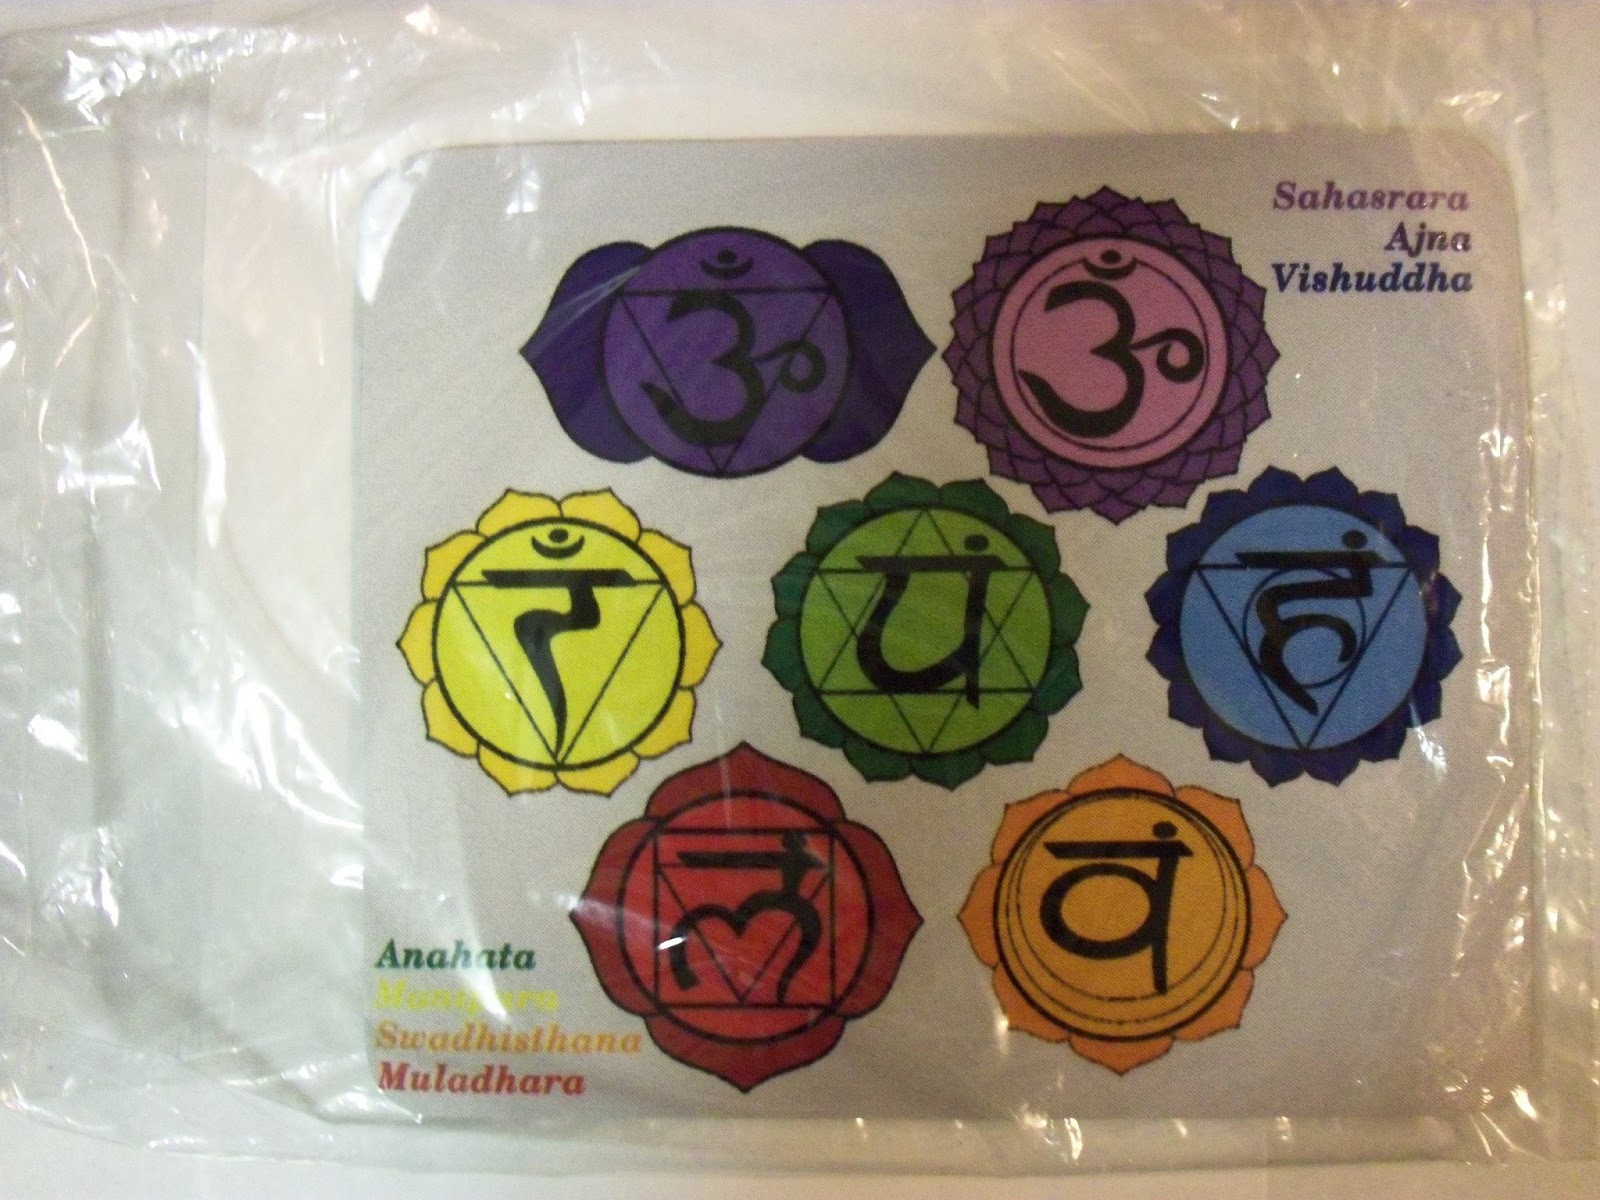 Yoga reiki seven chakra symbols art chart poster yoga reiki blue chakra mousepad wrist rest chakra symbol color colorful green rainbow red seven chakra symbol vibrant yoga accessories yoga art yoga biocorpaavc